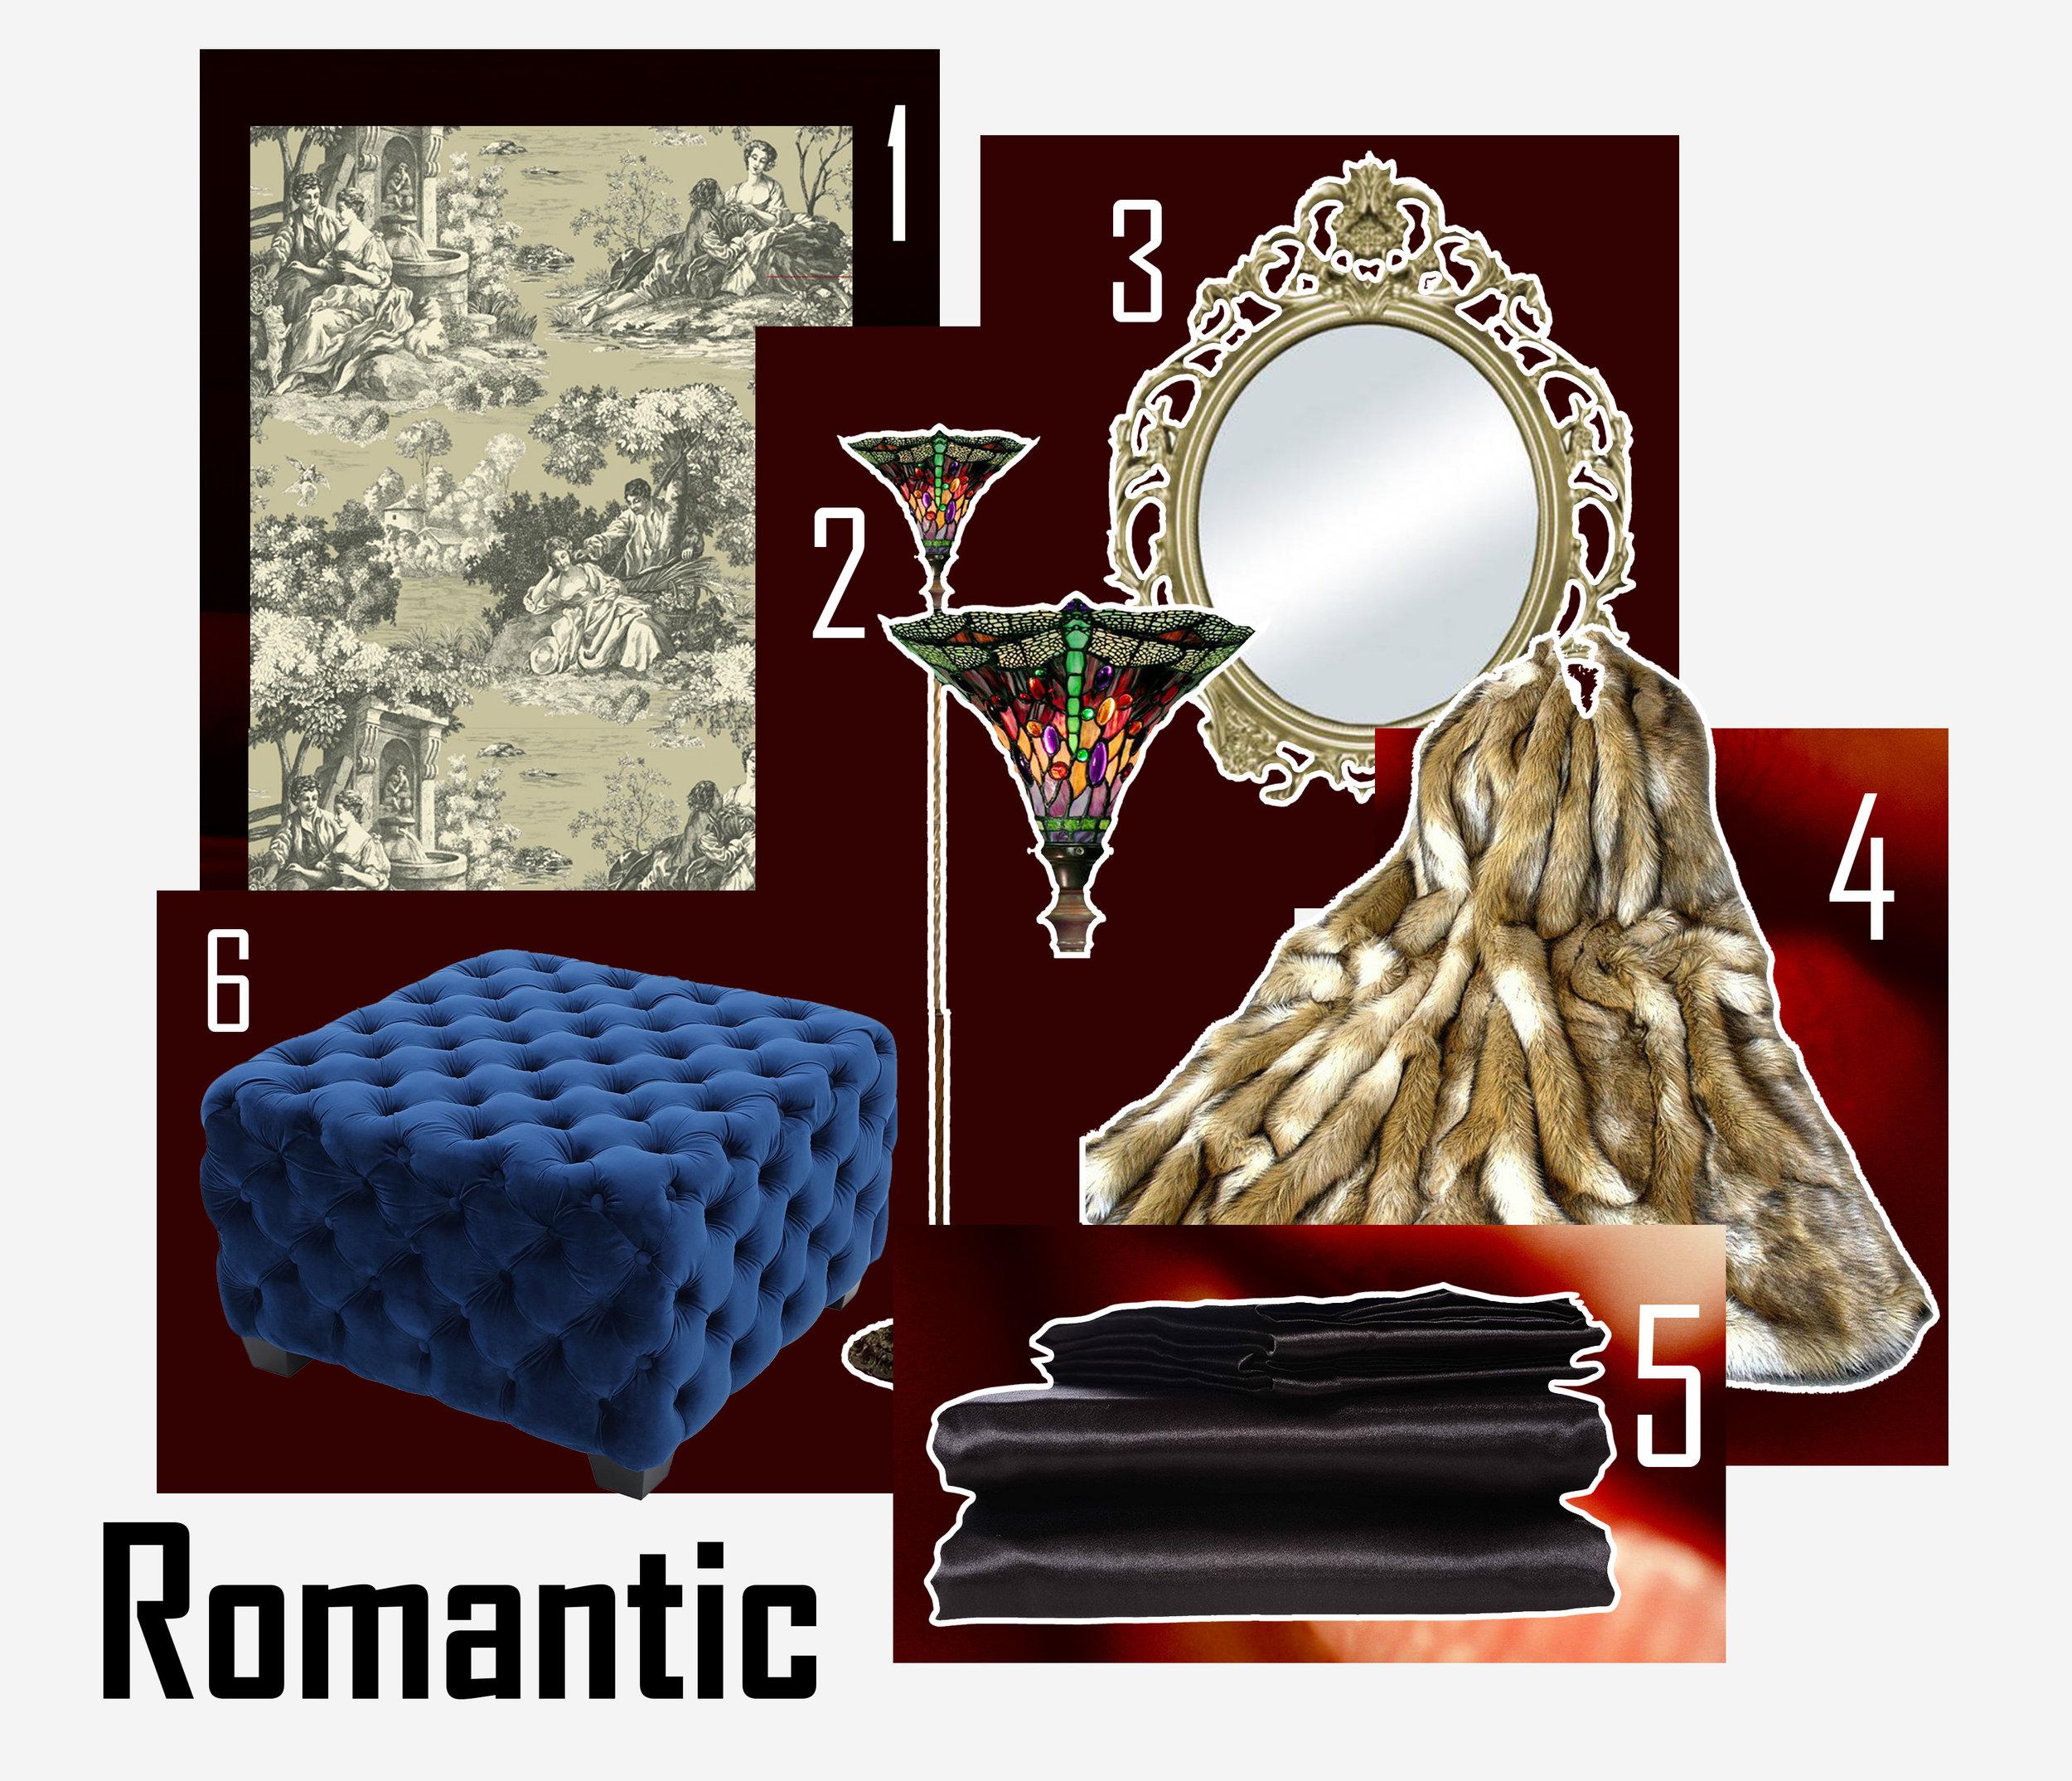 romantic-love-den-2.jpg